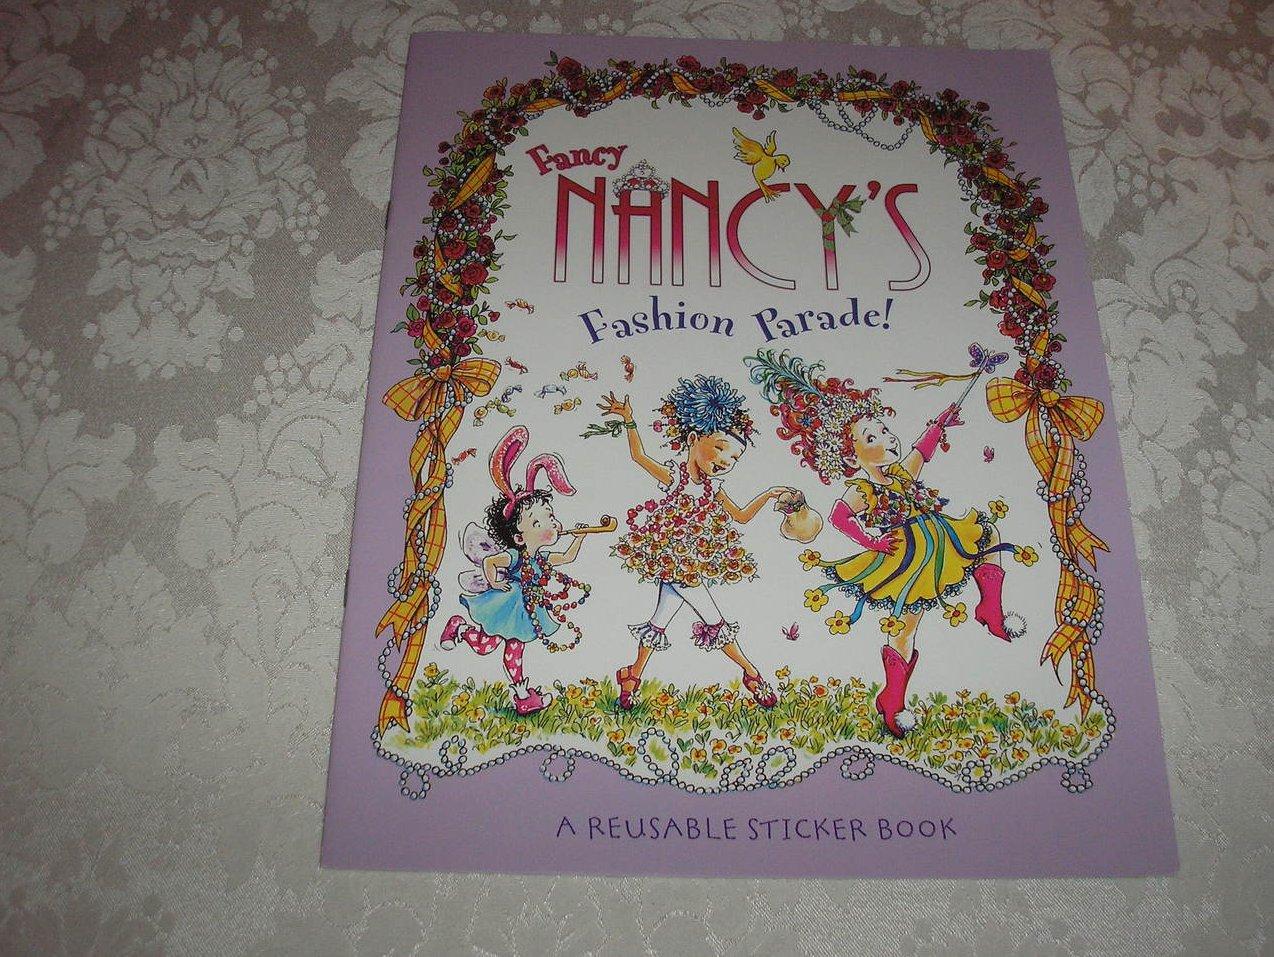 Fancy Nancy's Fashion Parade! brand new sc reusable sticker book